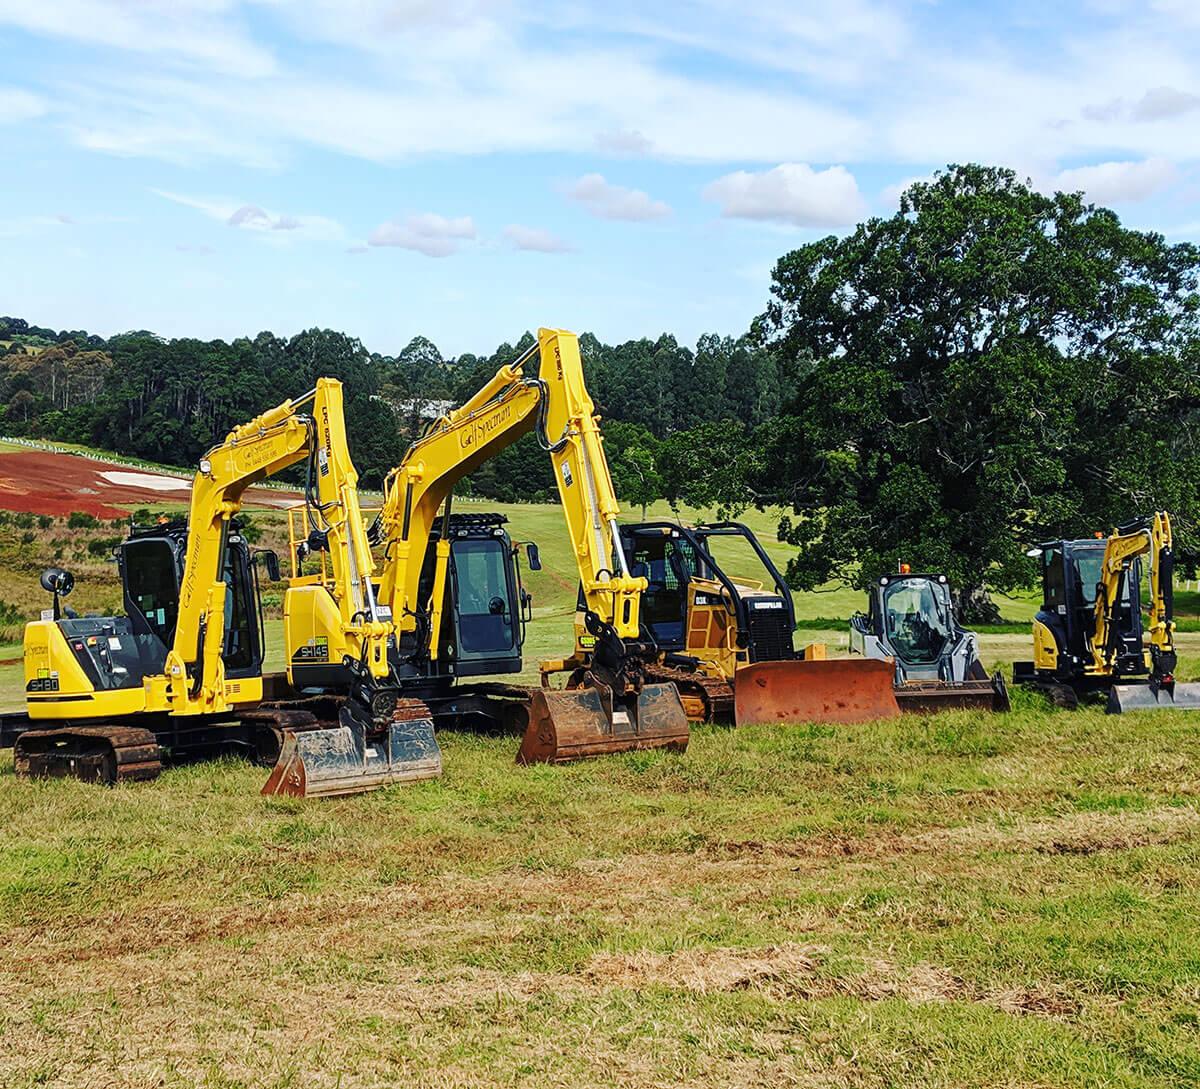 golf-spectrum-posi-track-excavator-hire-fleet